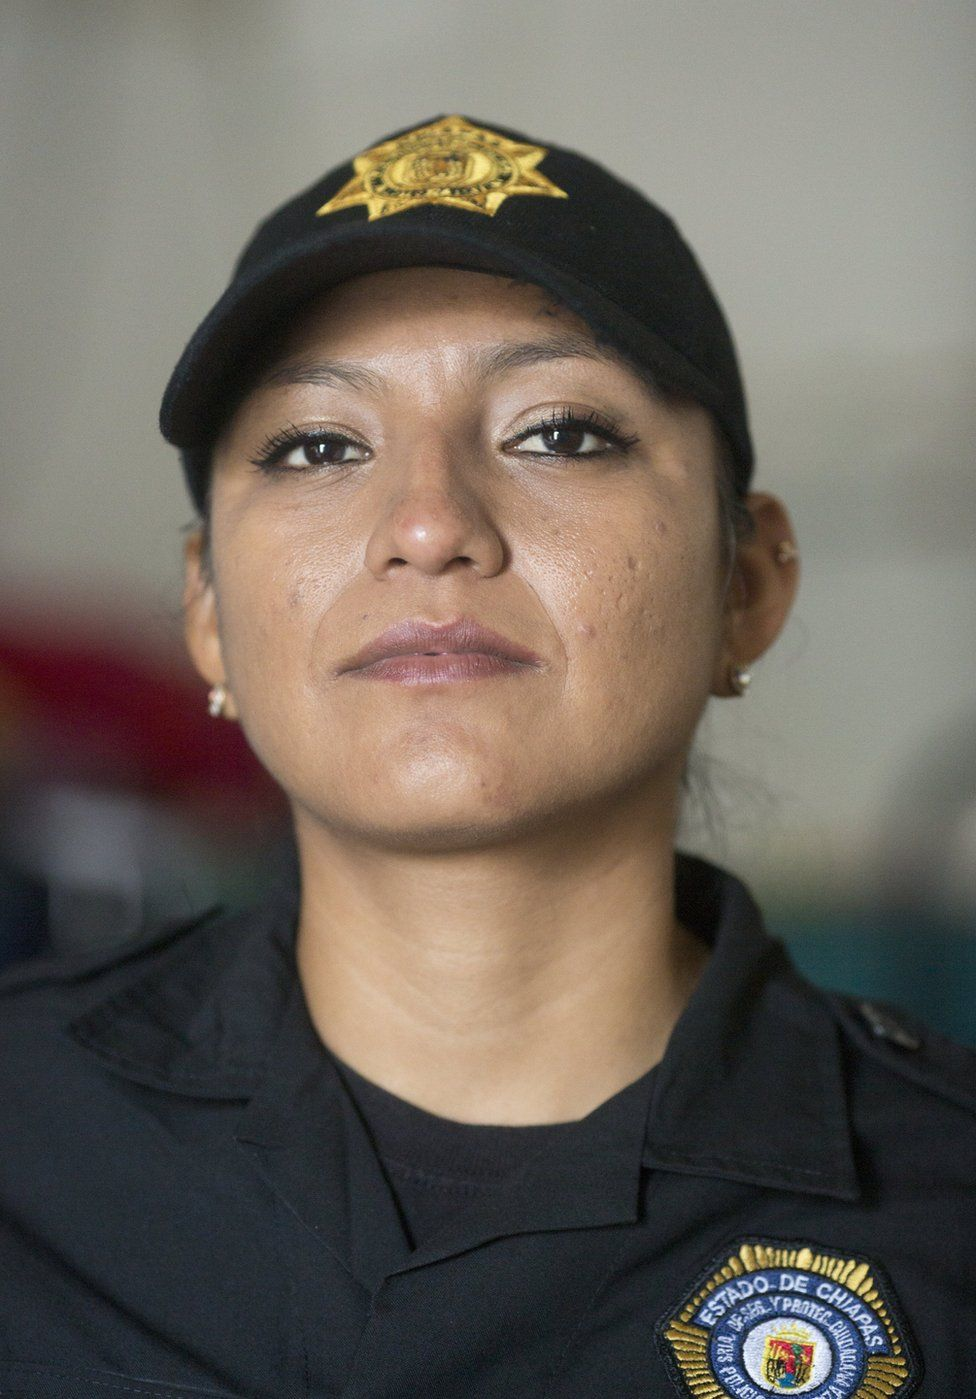 Sgt Lopez in her uniform